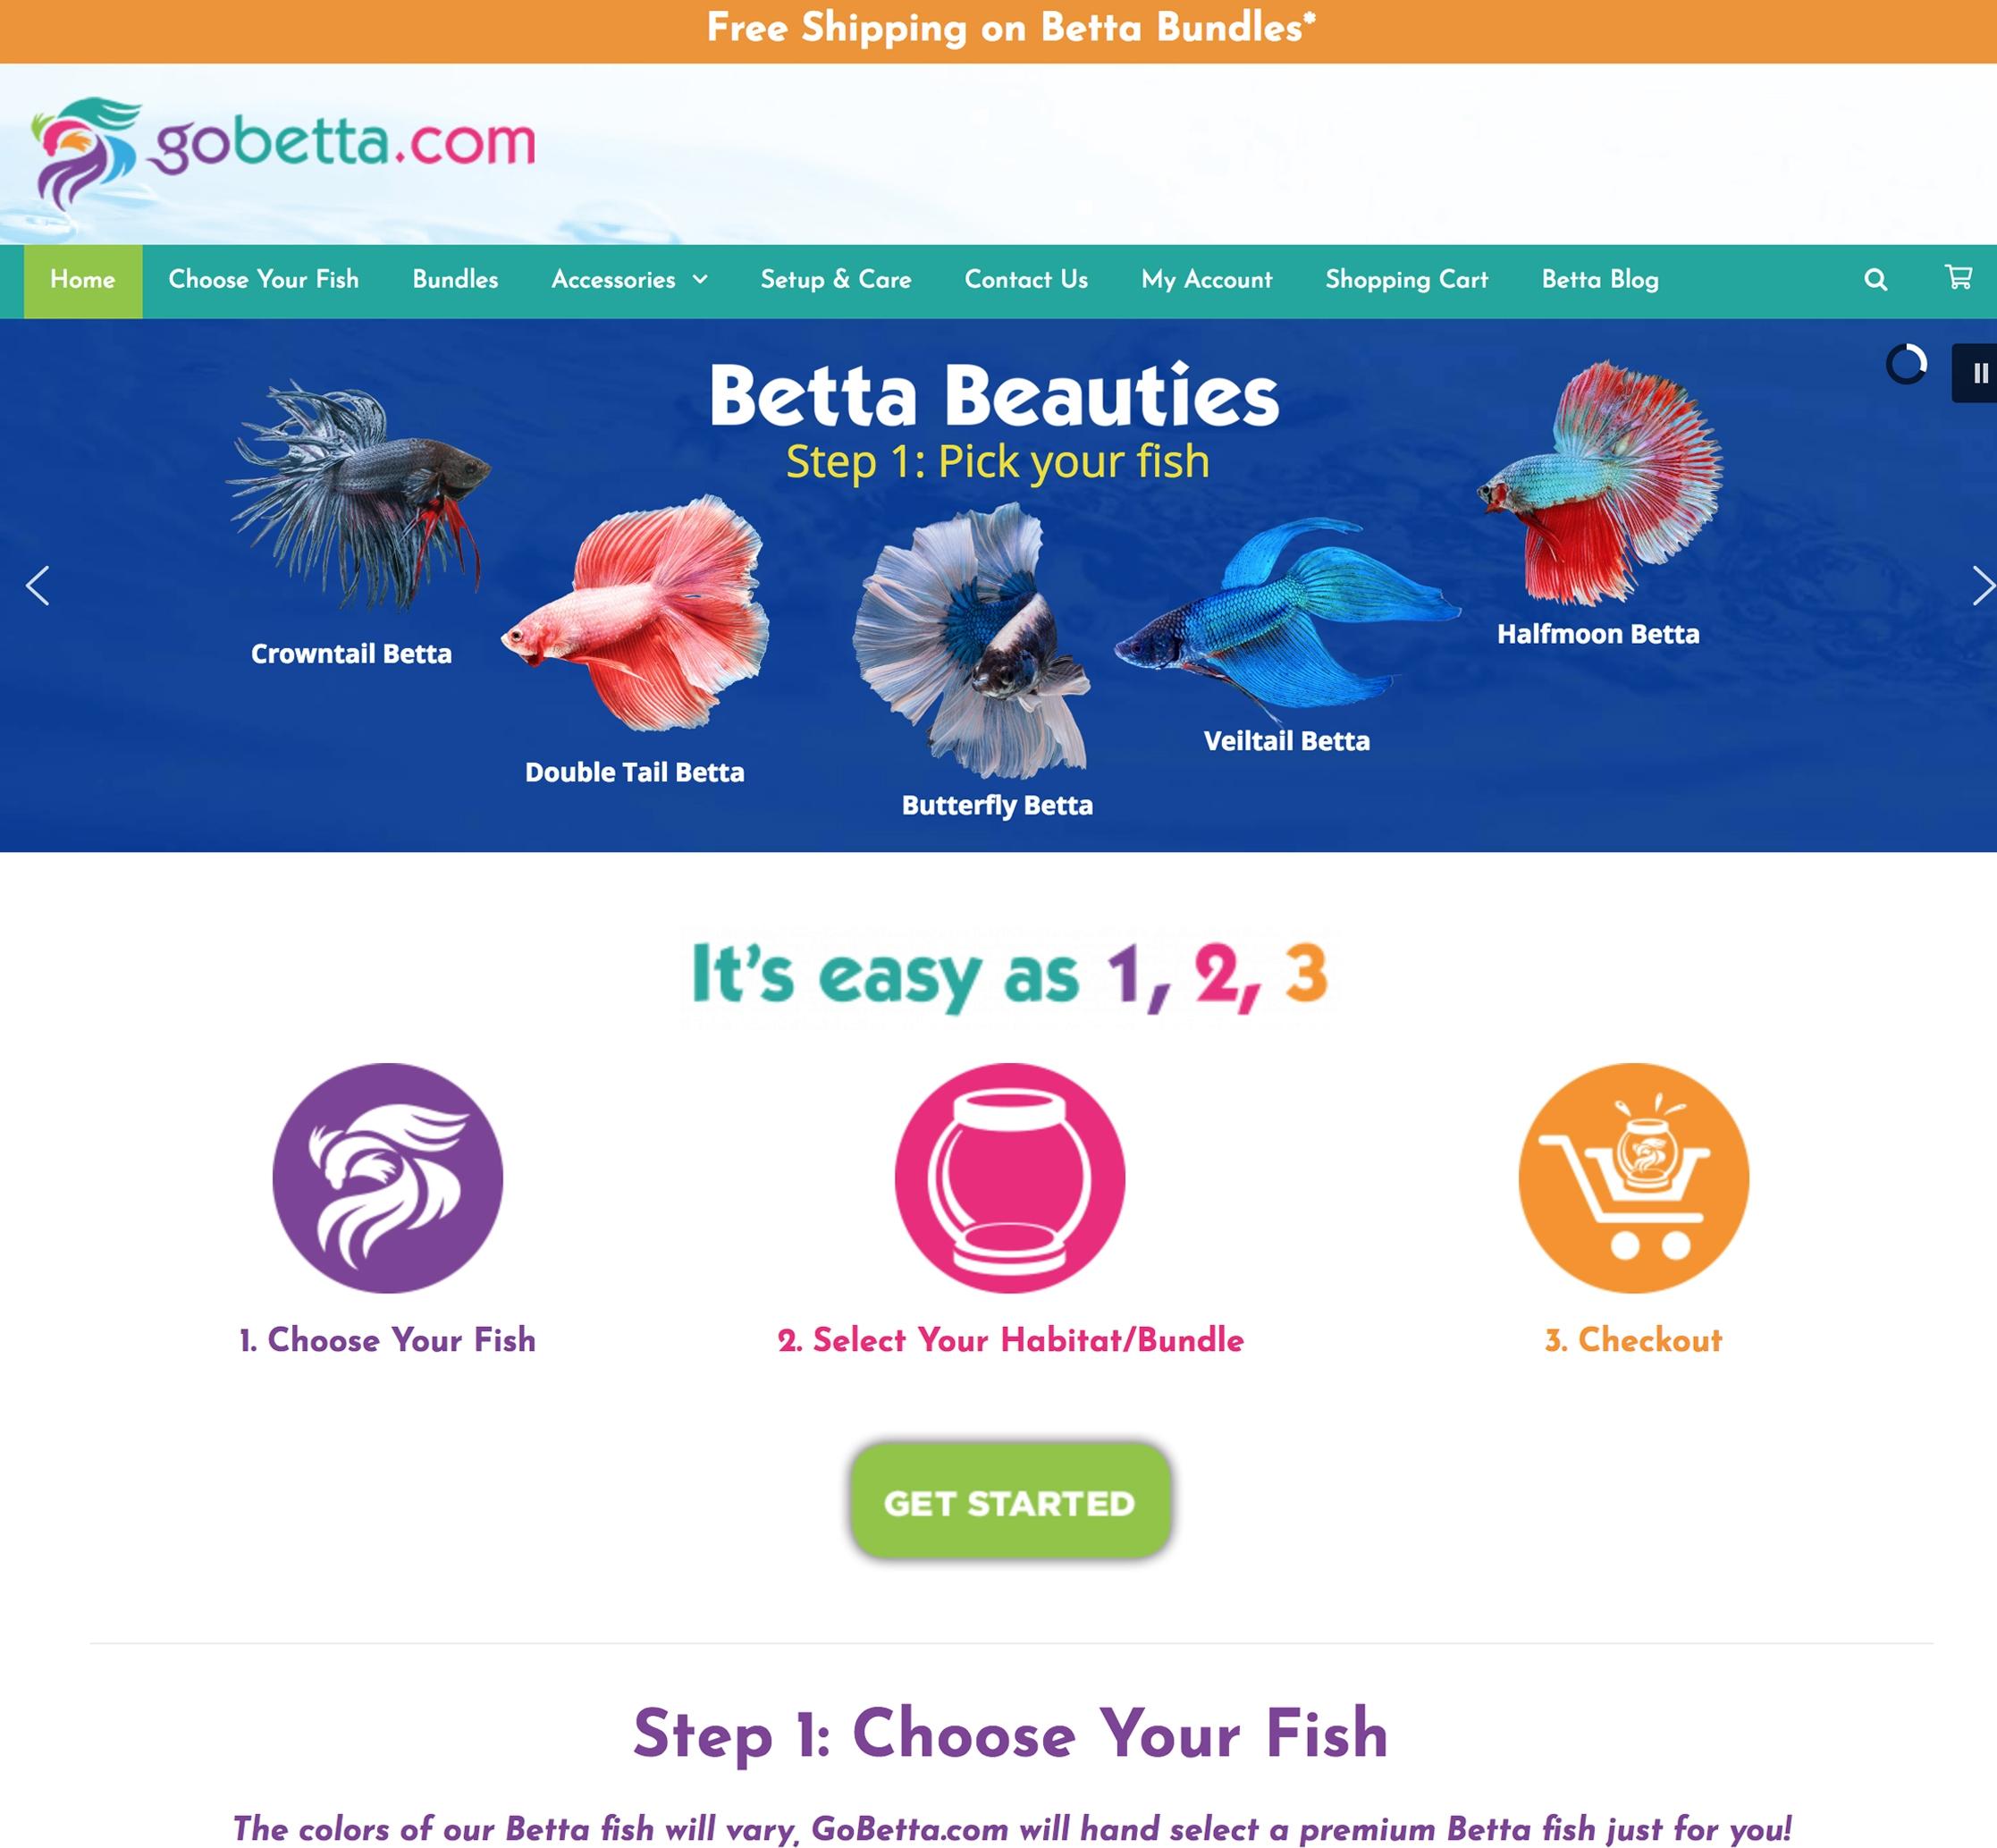 GoBetta.com